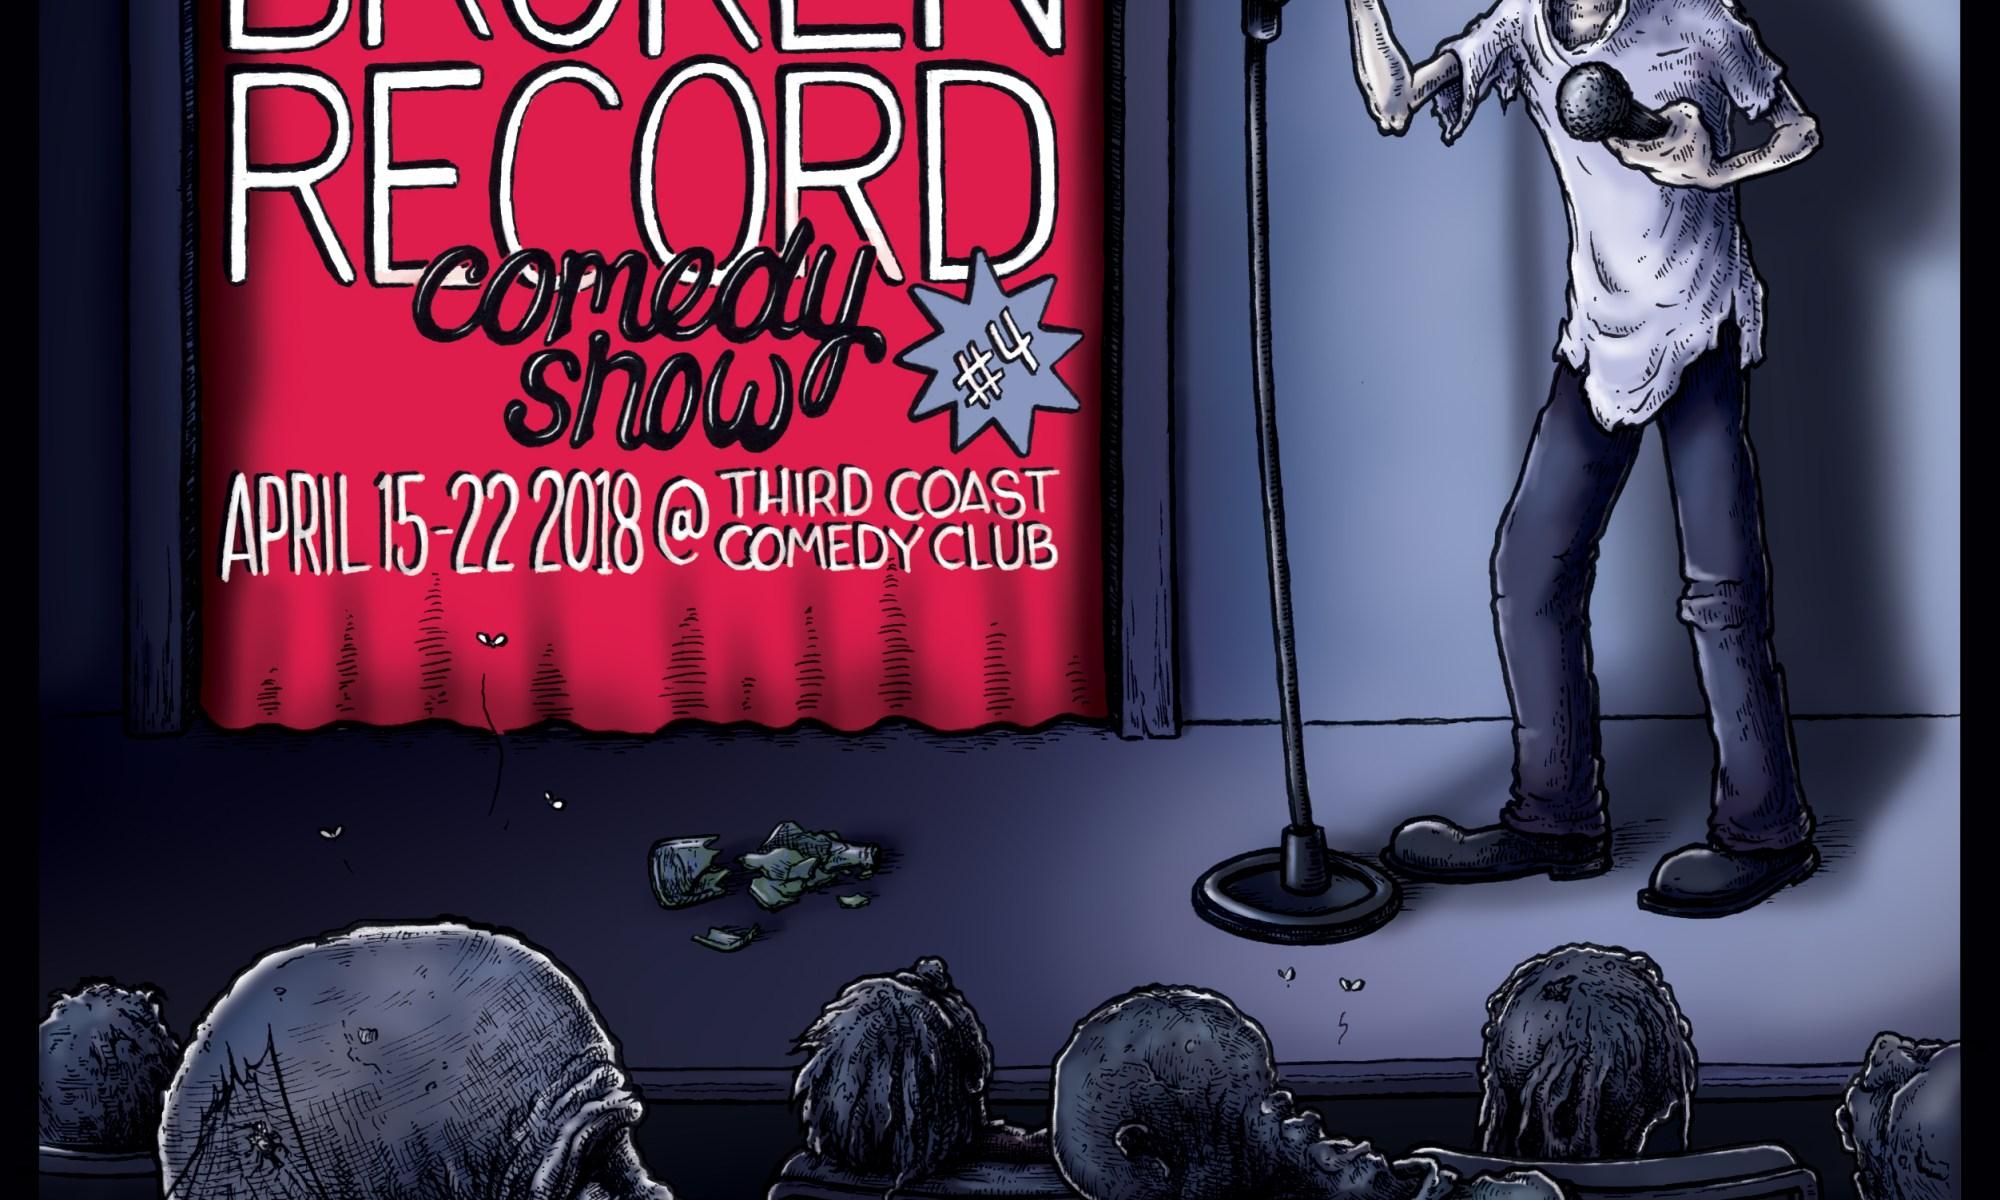 #BrokenRecordShow 4: April 15-22, 2018 at Third Coast Comedy Club